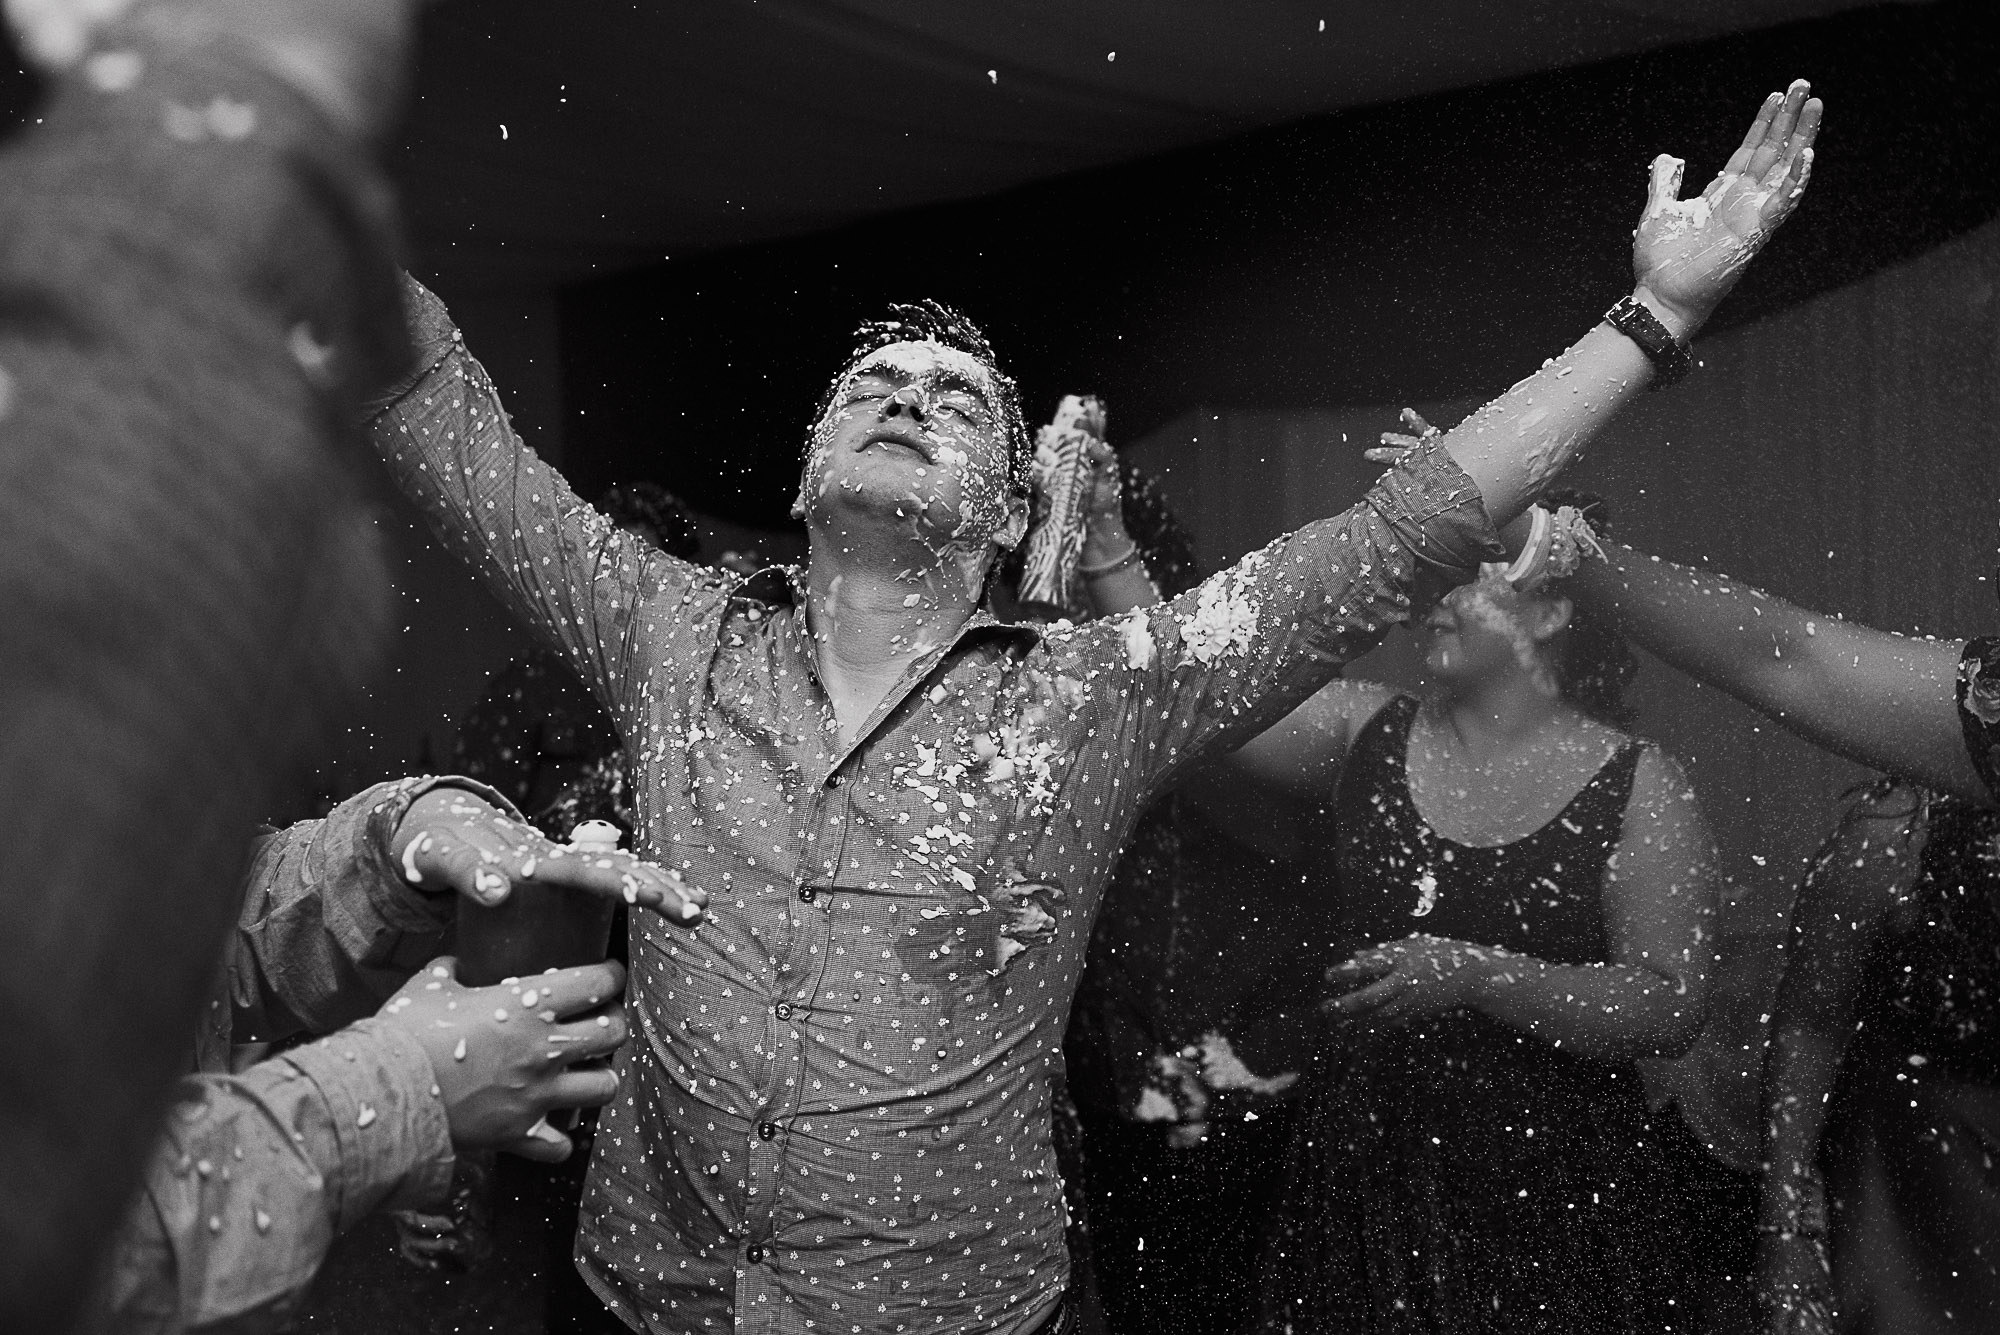 boda-vero-raul-patagonia-argentina-chilena-fotografo-de-bodas-argentina-casamiento-en-patagonia-gabriel-roa-photography-33